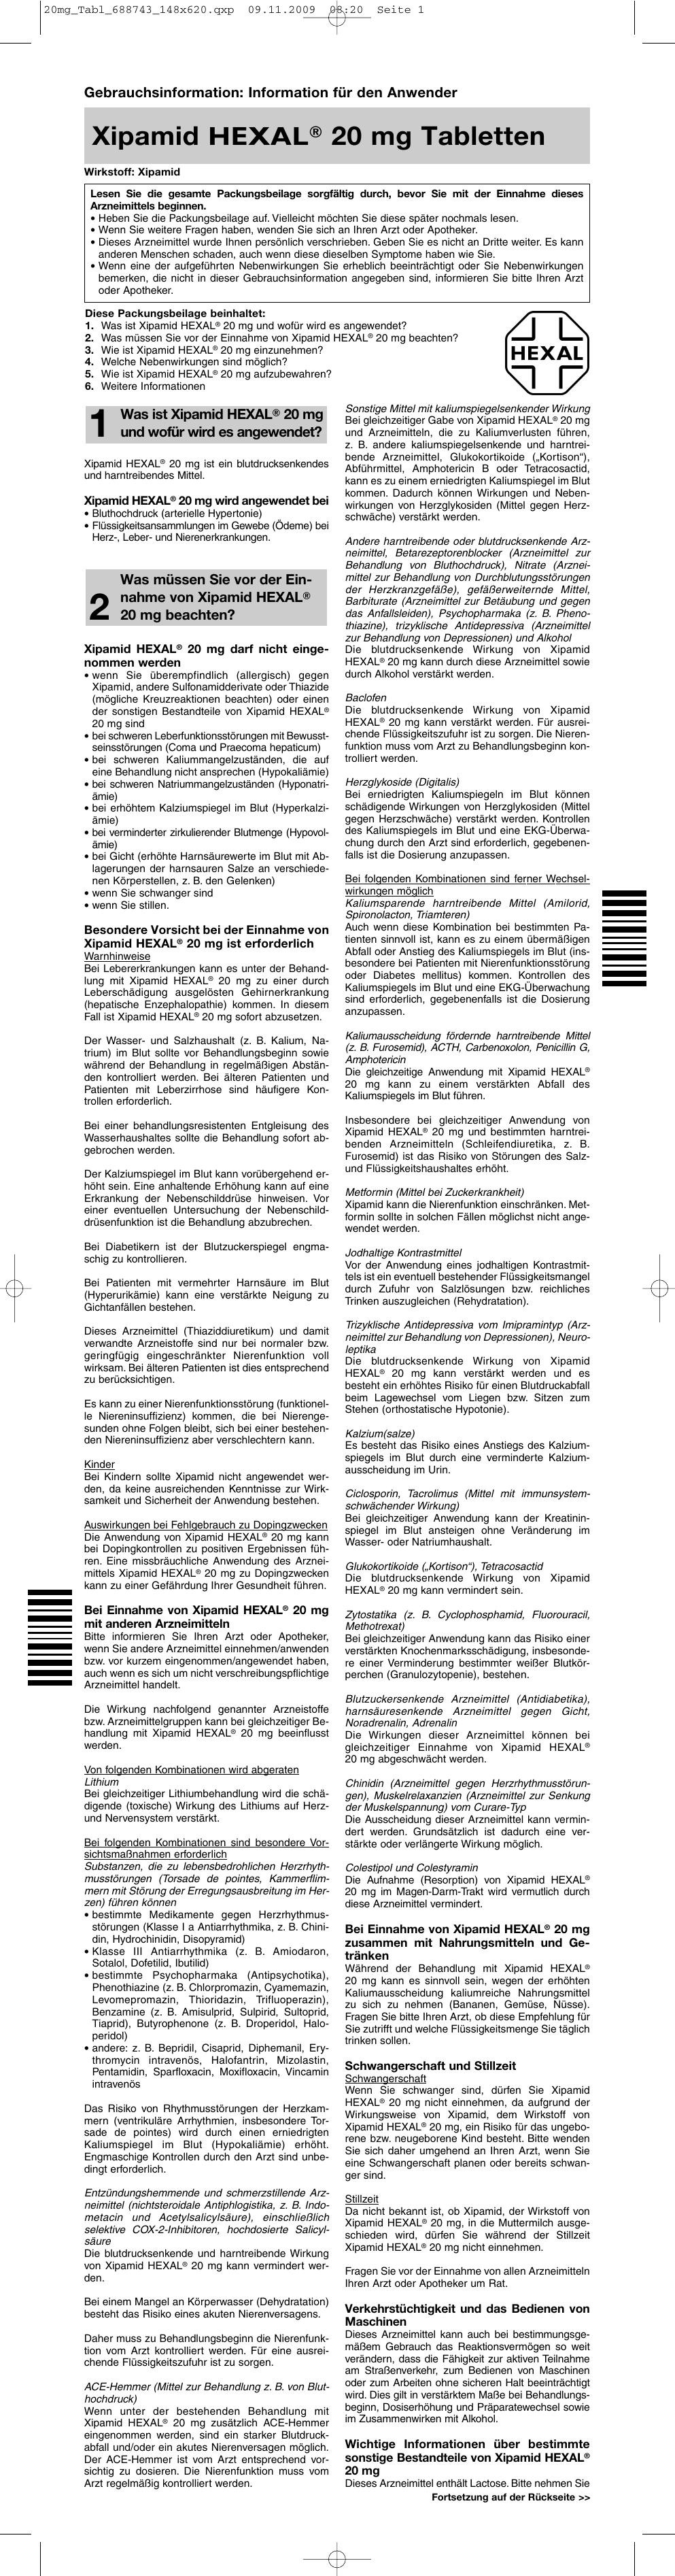 Xipamid HEXAL® 20 mg Tabletten - medikamente-per